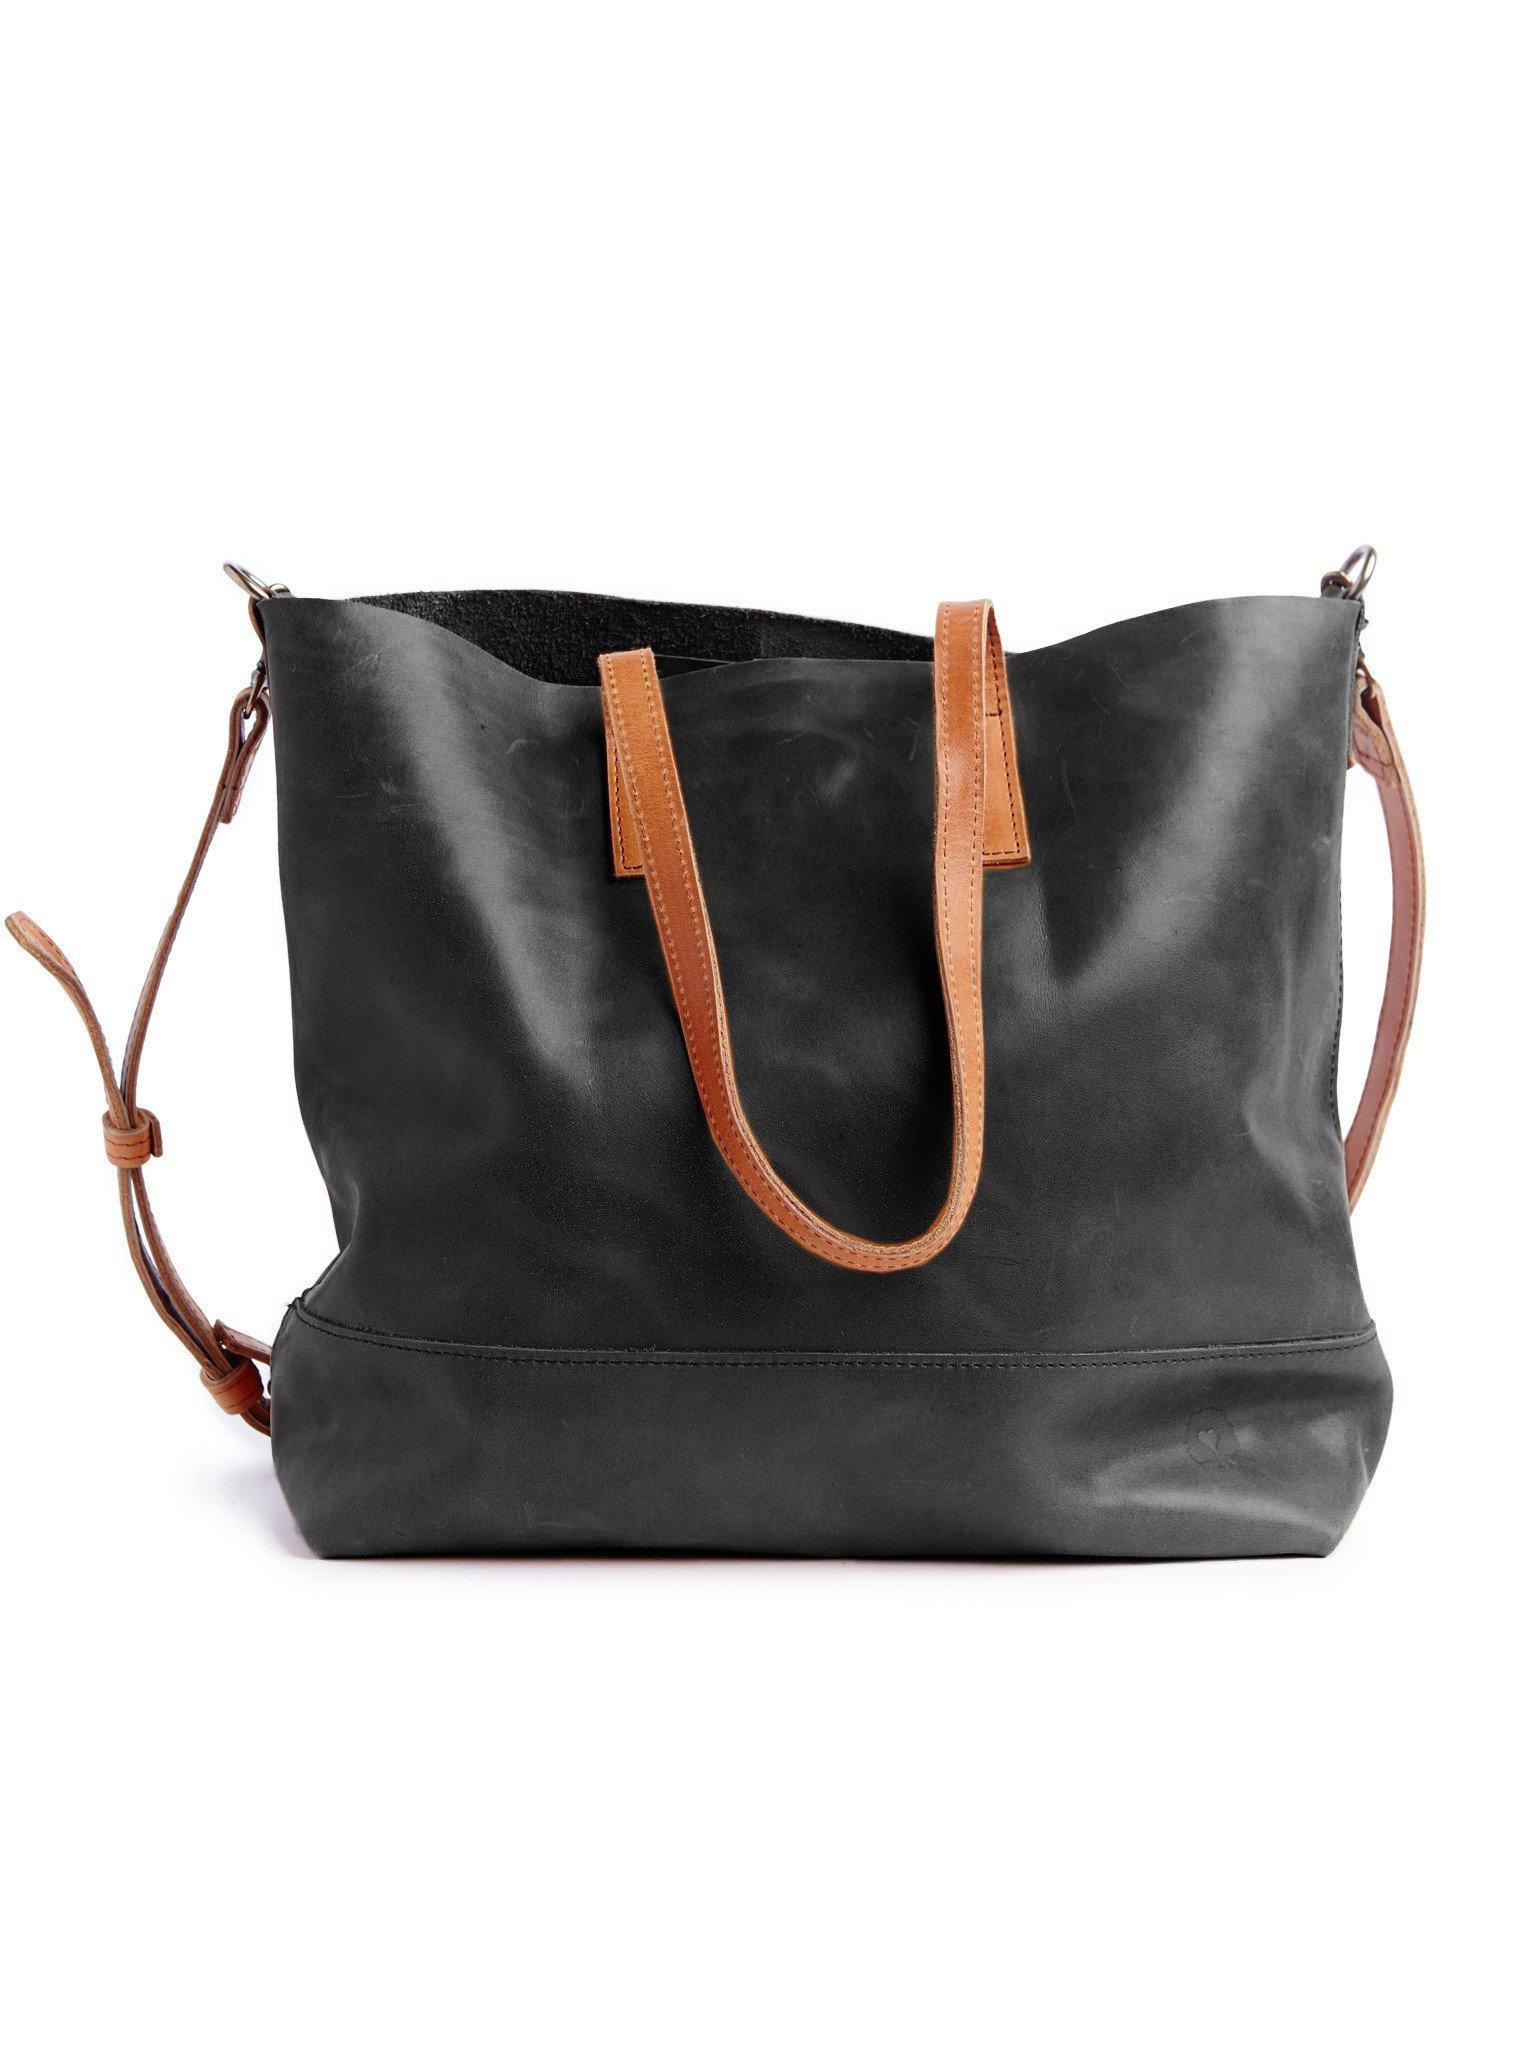 Fashionable Abera Tote  |$178